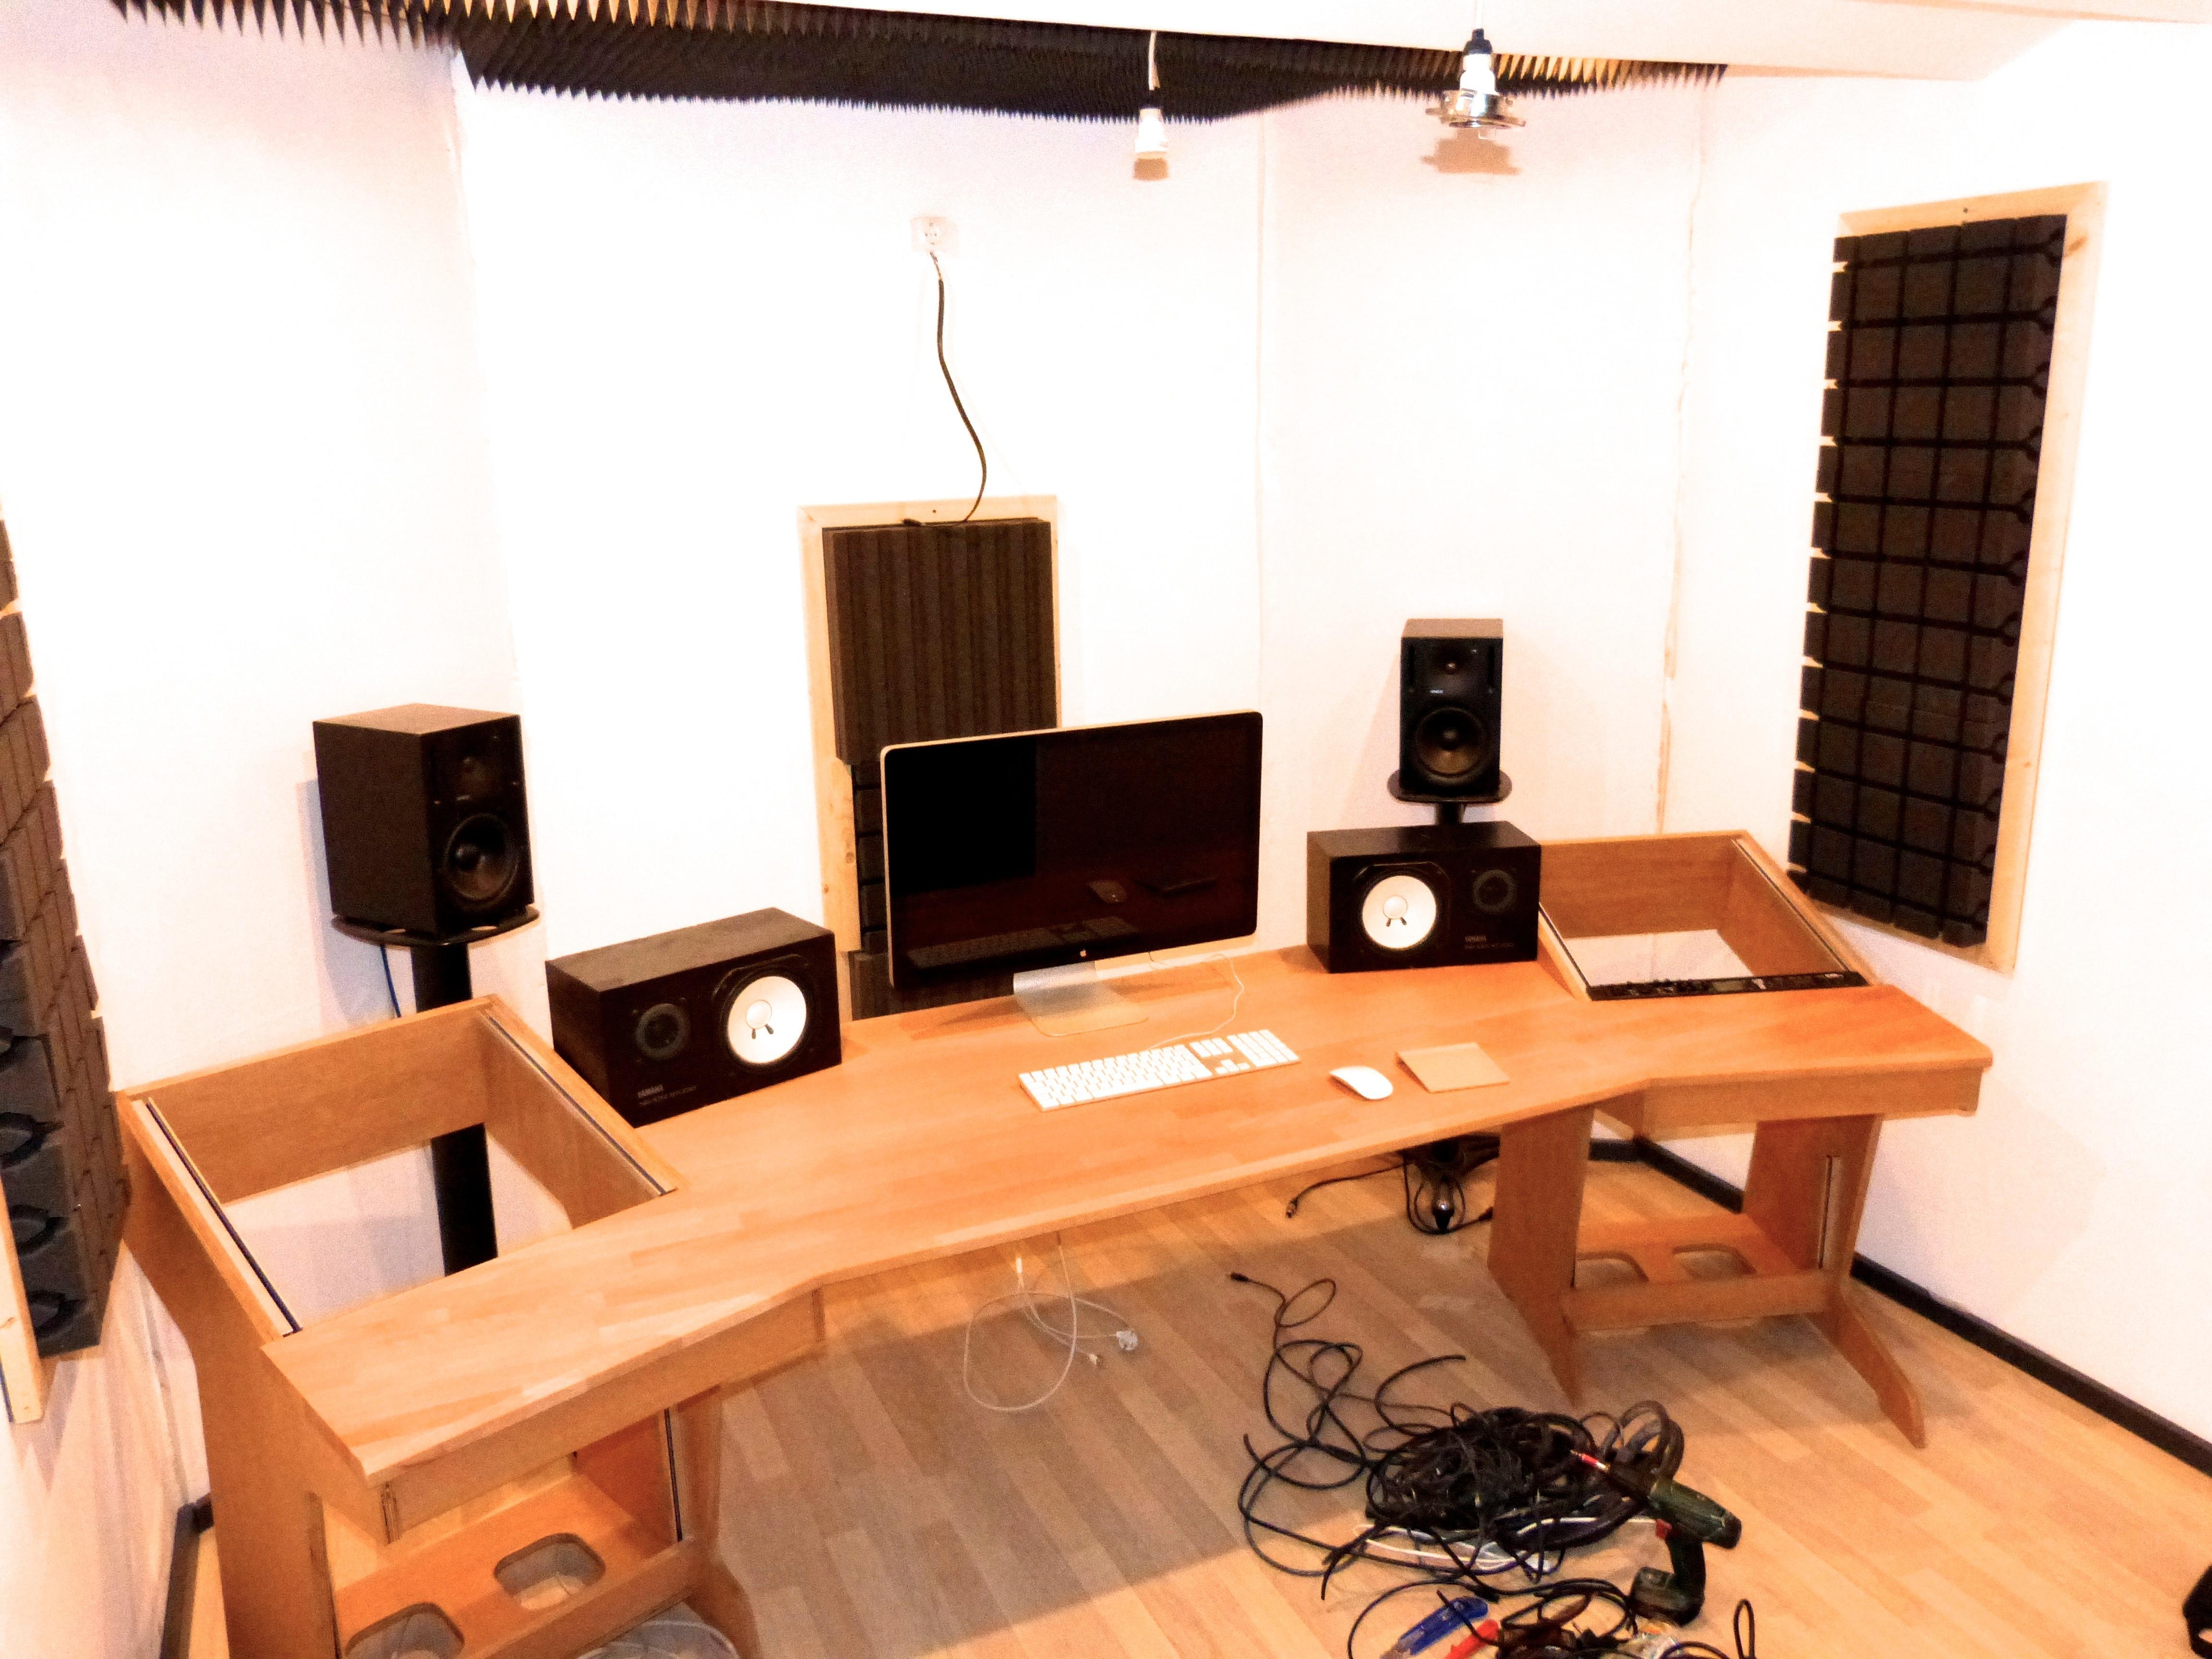 Tisch camaromusic Studio2